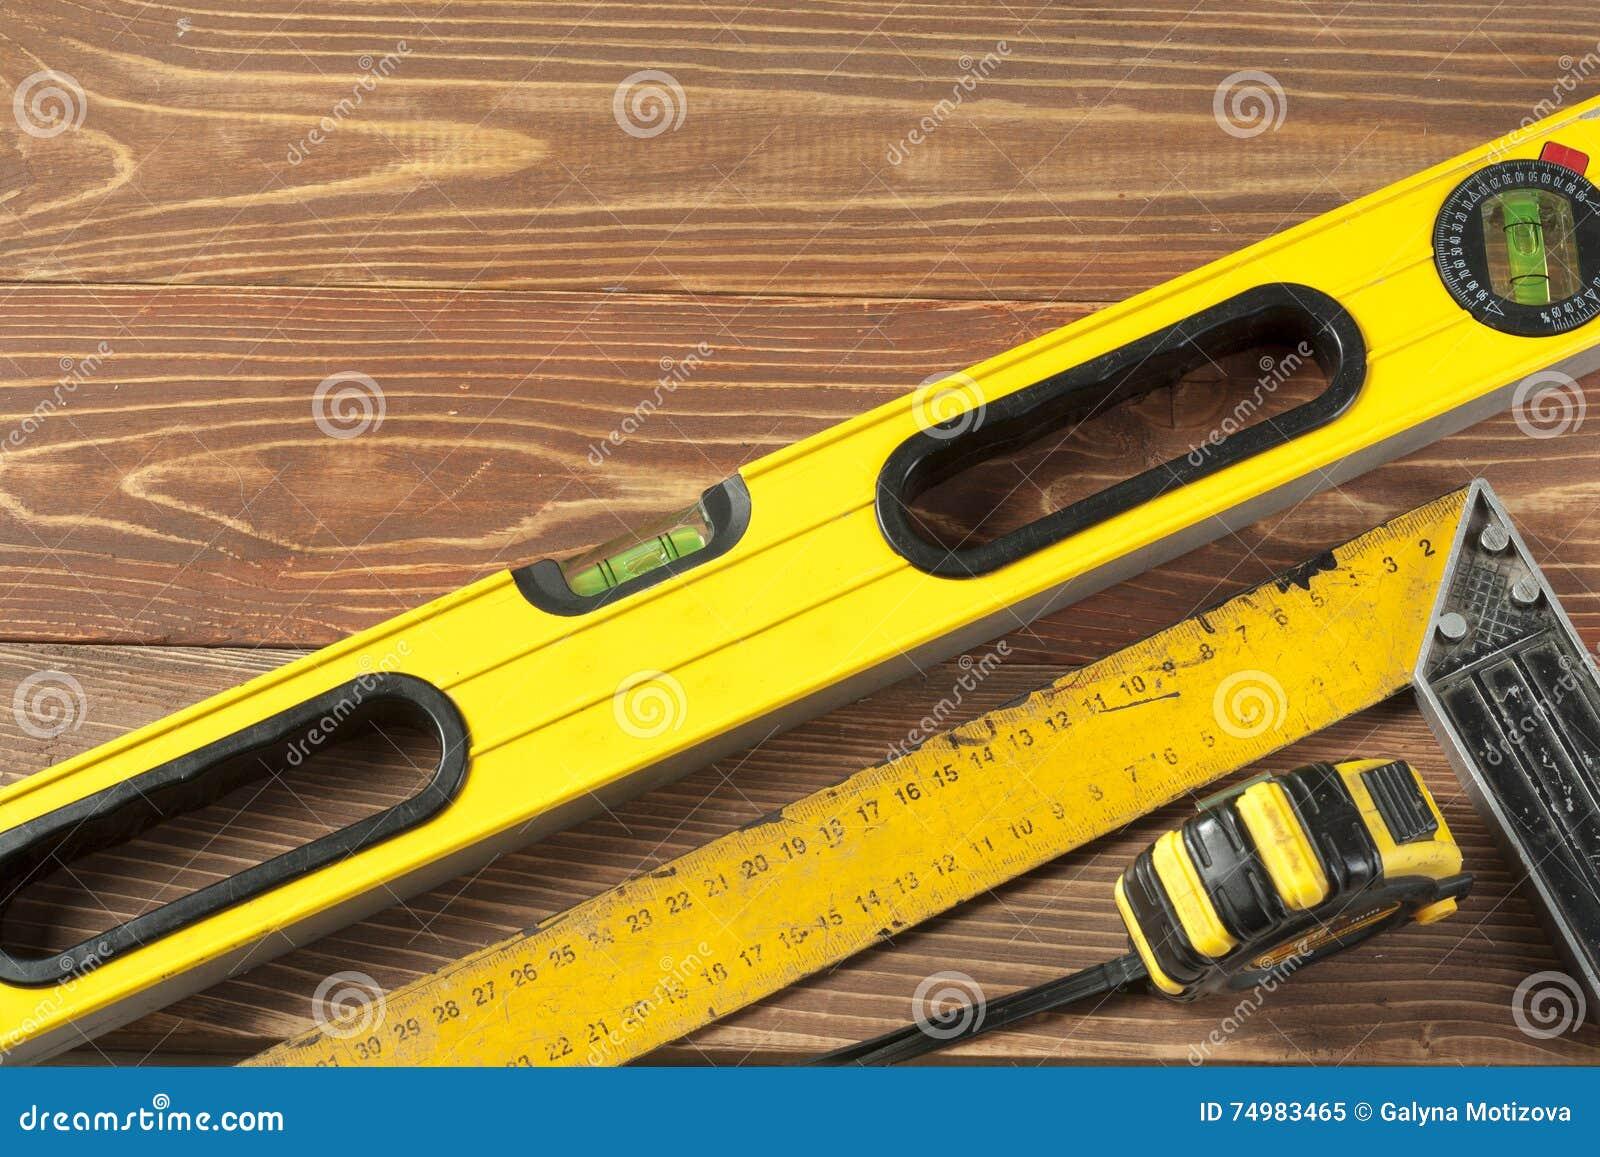 construction level ruler royalty